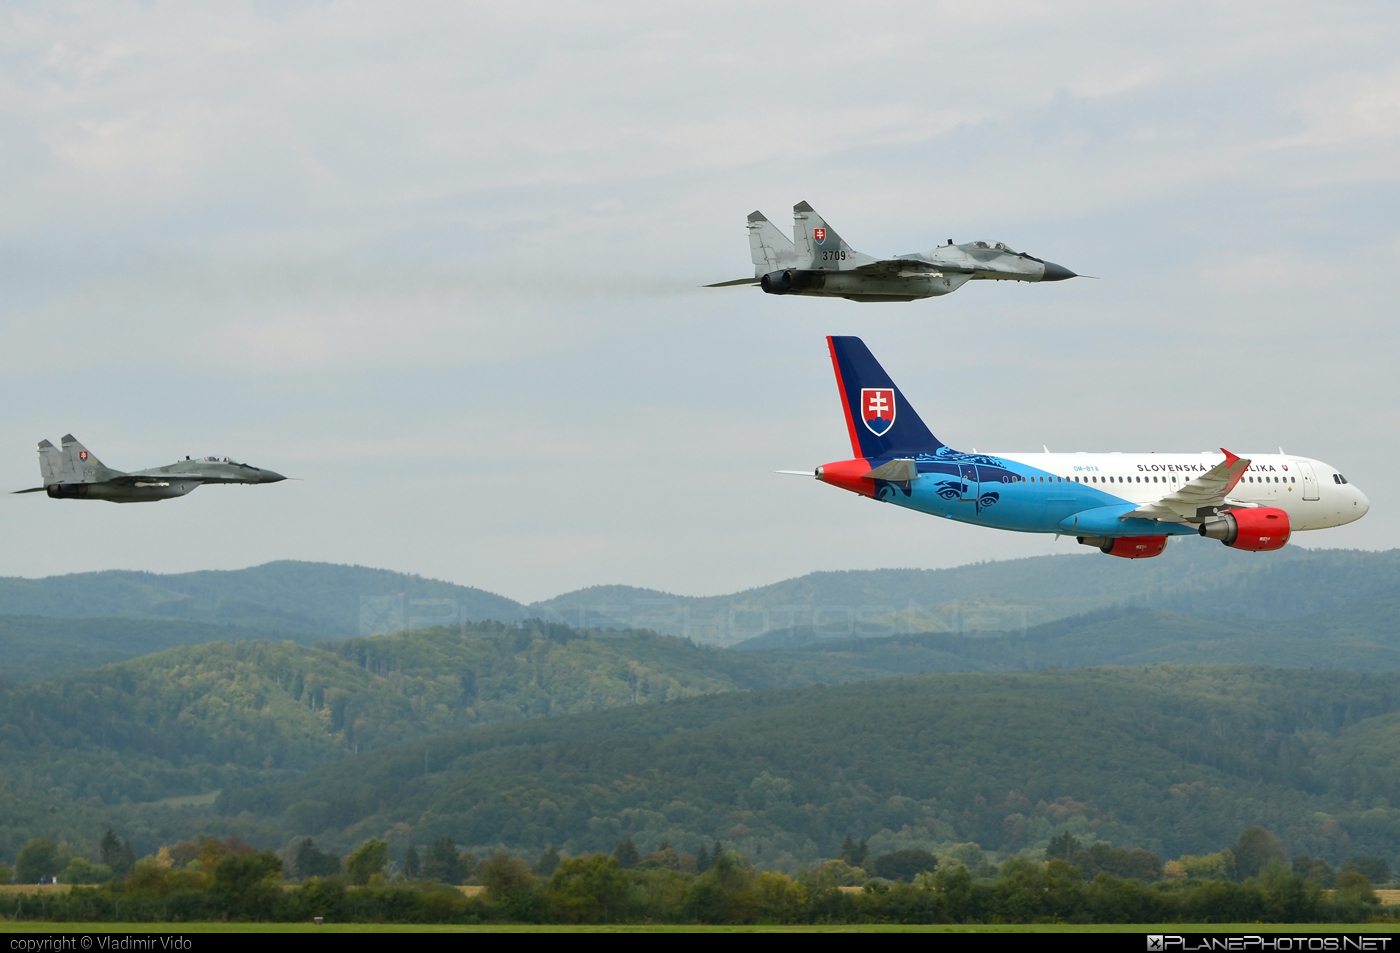 Mikoyan-Gurevich MiG-29AS - 3709 operated by Vzdušné sily OS SR (Slovak Air Force) #mig #mig29 #mig29as #mikoyangurevich #siaf2018 #slovakairforce #vzdusnesilyossr